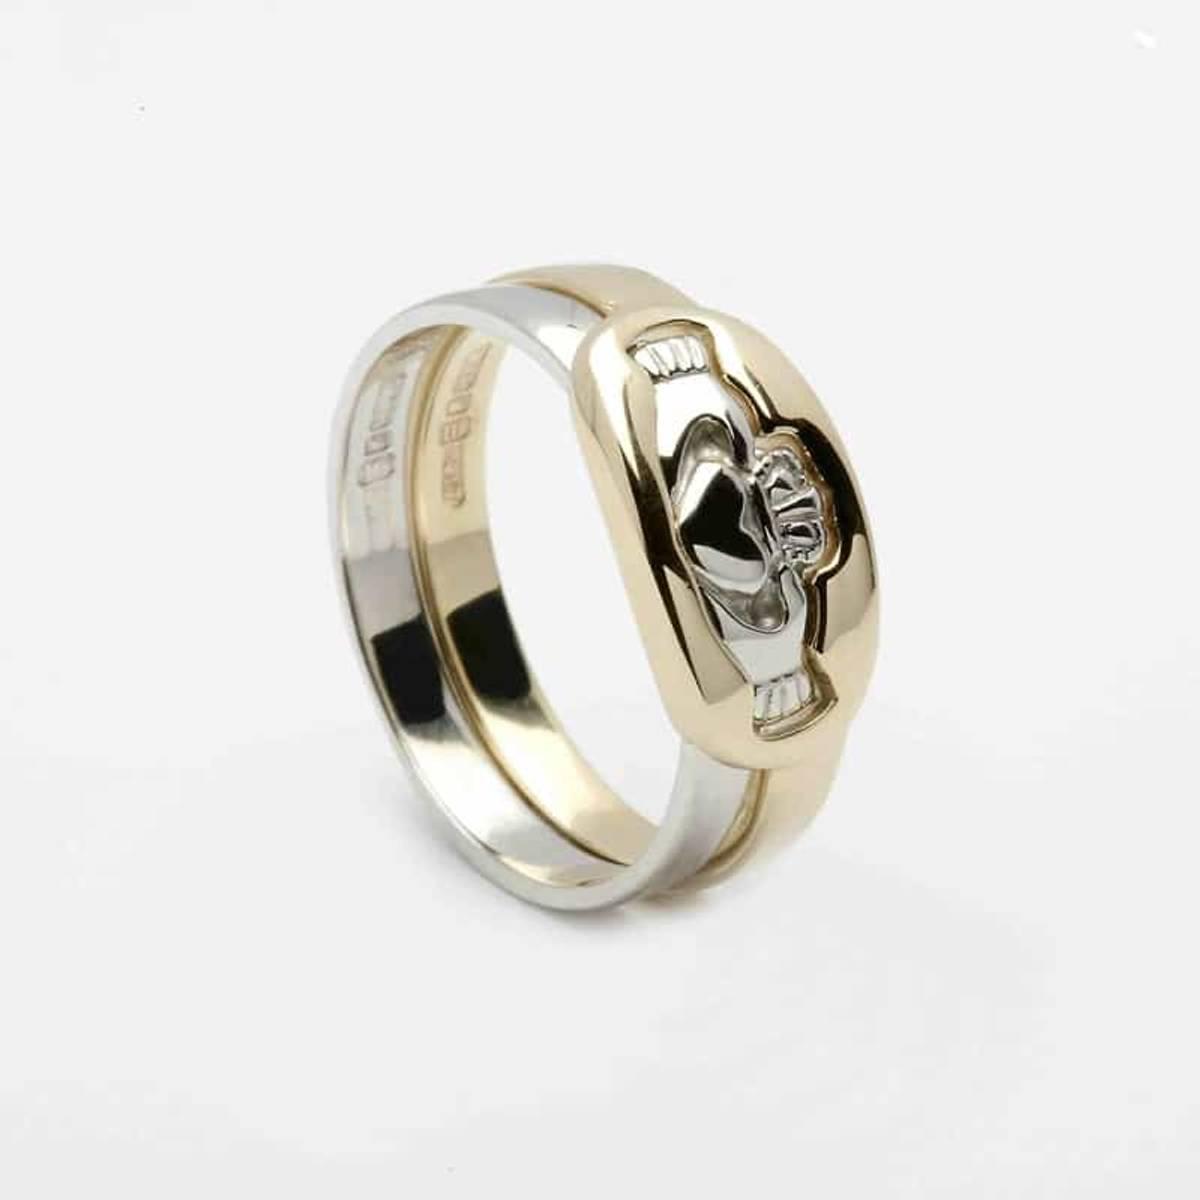 10 carat gold 2-part claddagh rings set